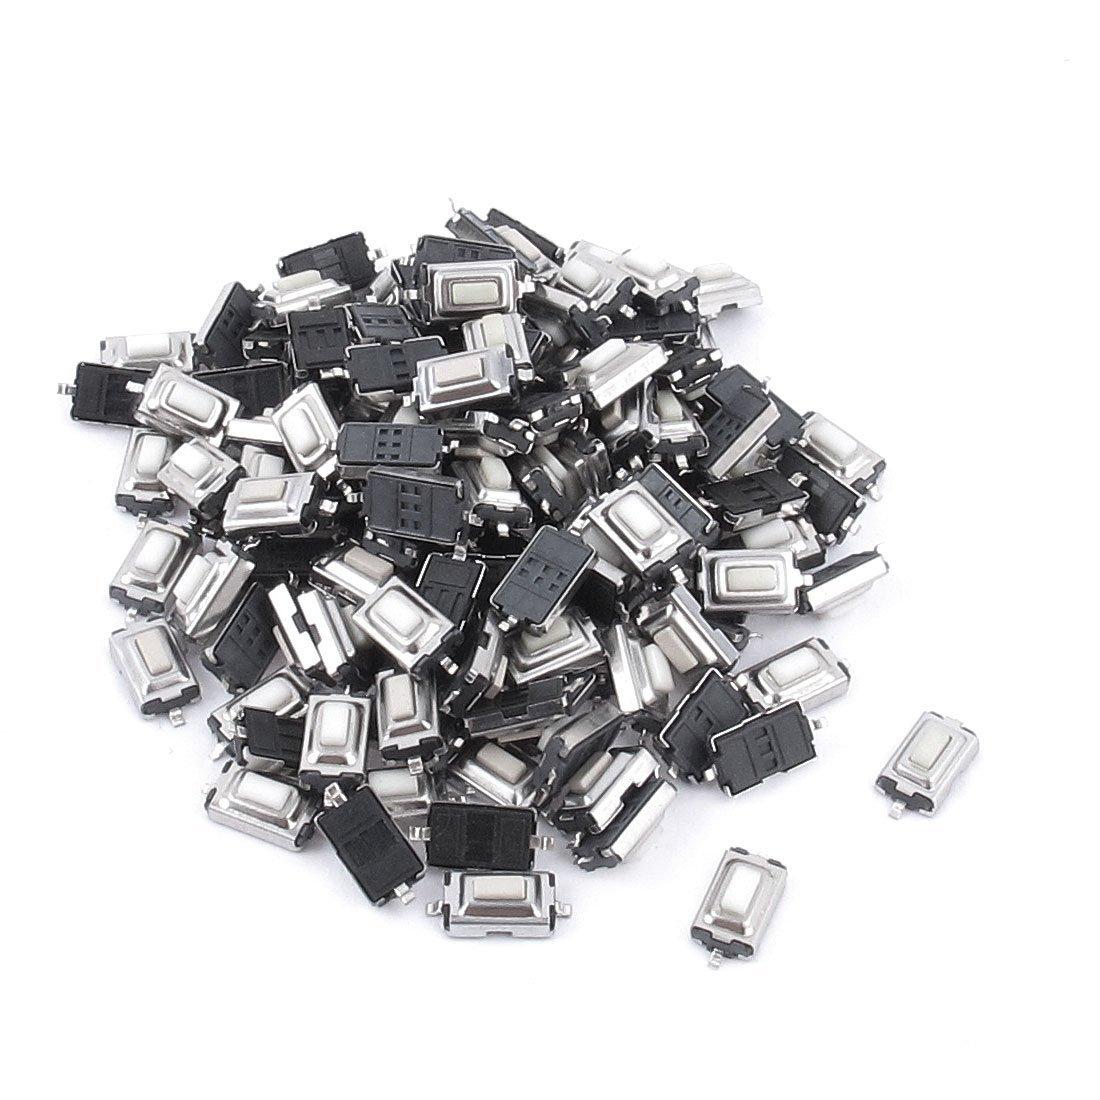 1000pcs Touch Micro Switch 3X6X2.5MM 3*6*2.5 SMD White Button Head cltgxdd aj 131 micro switch 3 5 3 1 8 for citroen c1 c2 c3 c4 c5 c6 c8 remote key fob repair switch micro button